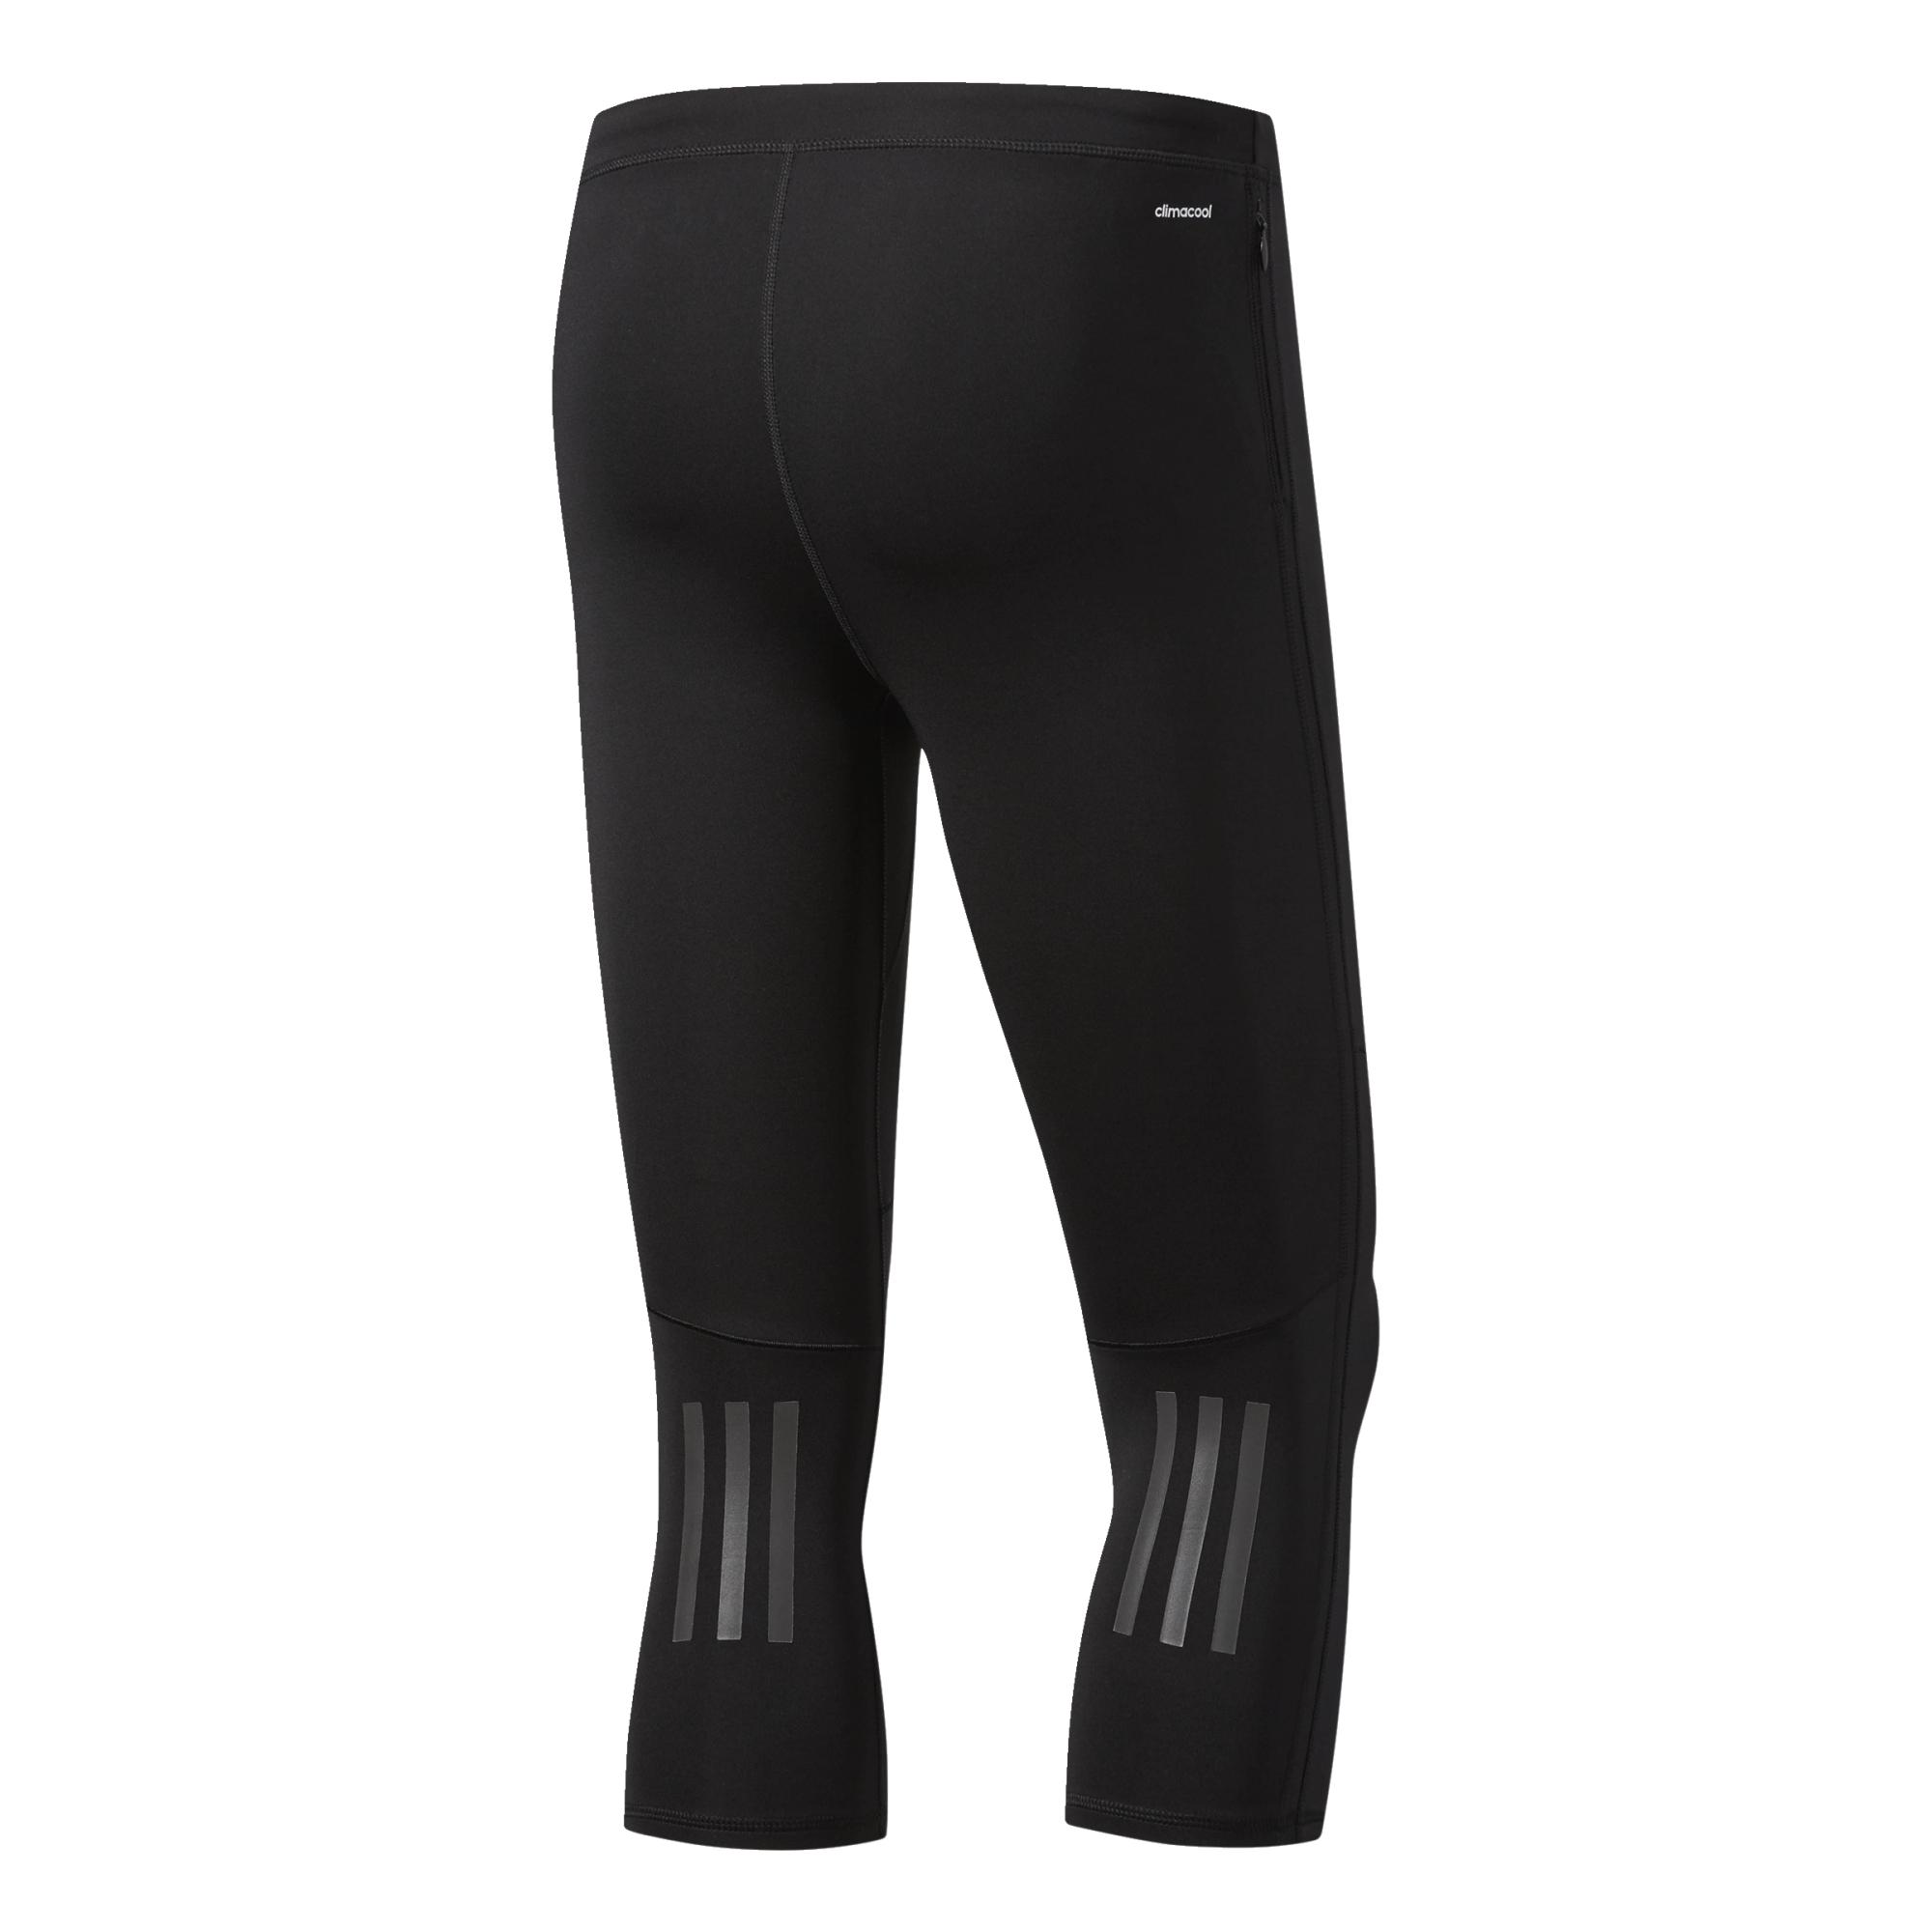 Details zu adidas Response 34 Tight Herren Laufhose Runningcapri Jogging Sporthose